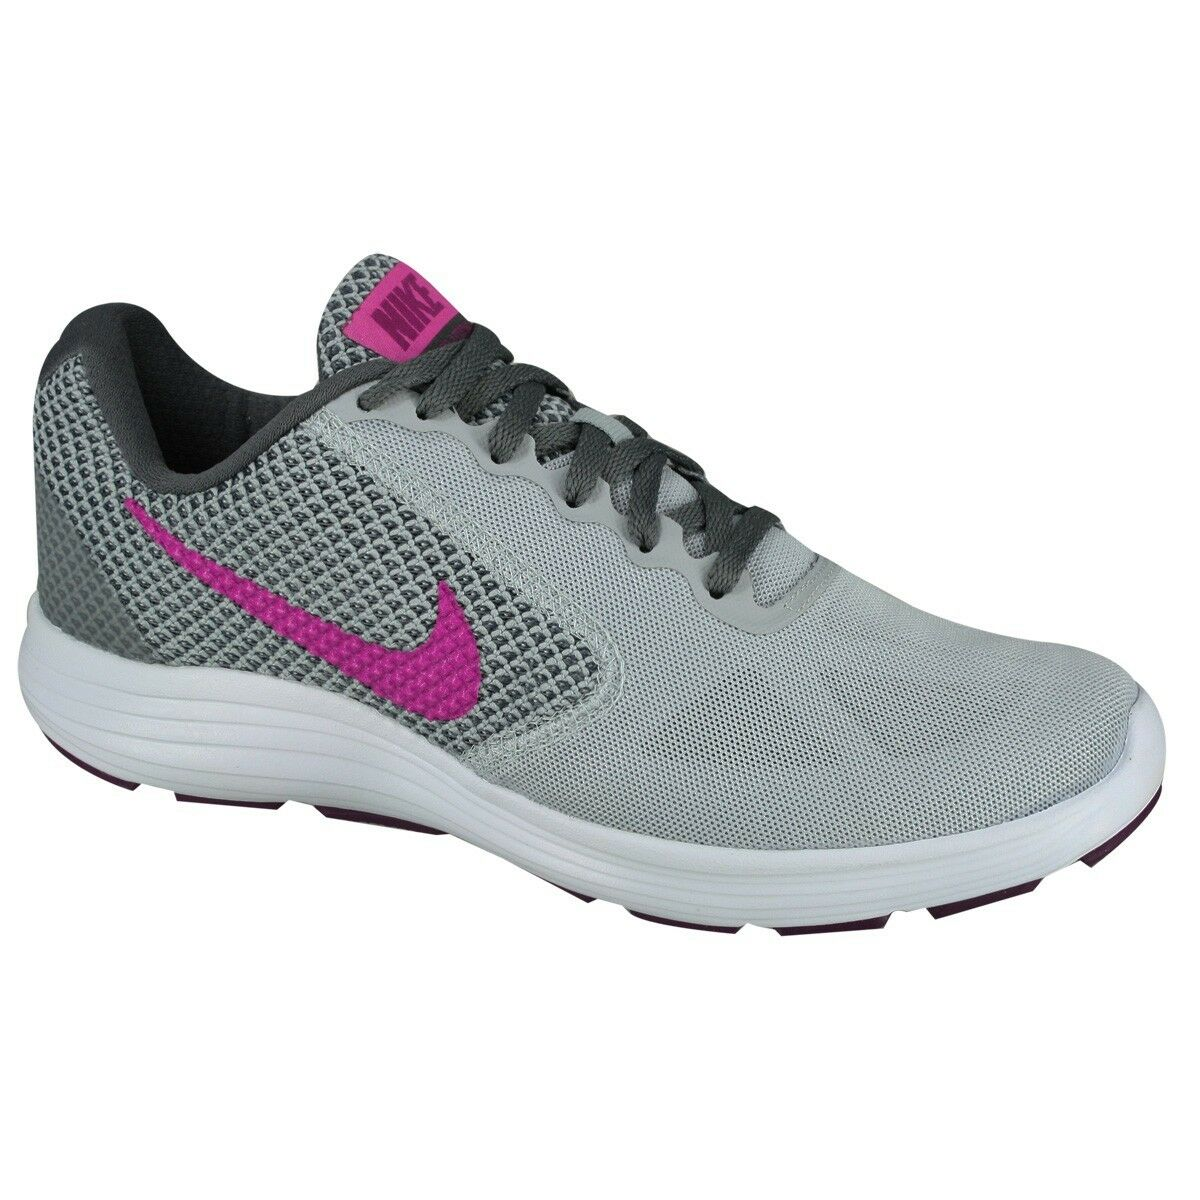 Nike Revolution 3 Free Damenschuhe Running Schuhe (B) (009) + Free 3 AUS Delivery 548436